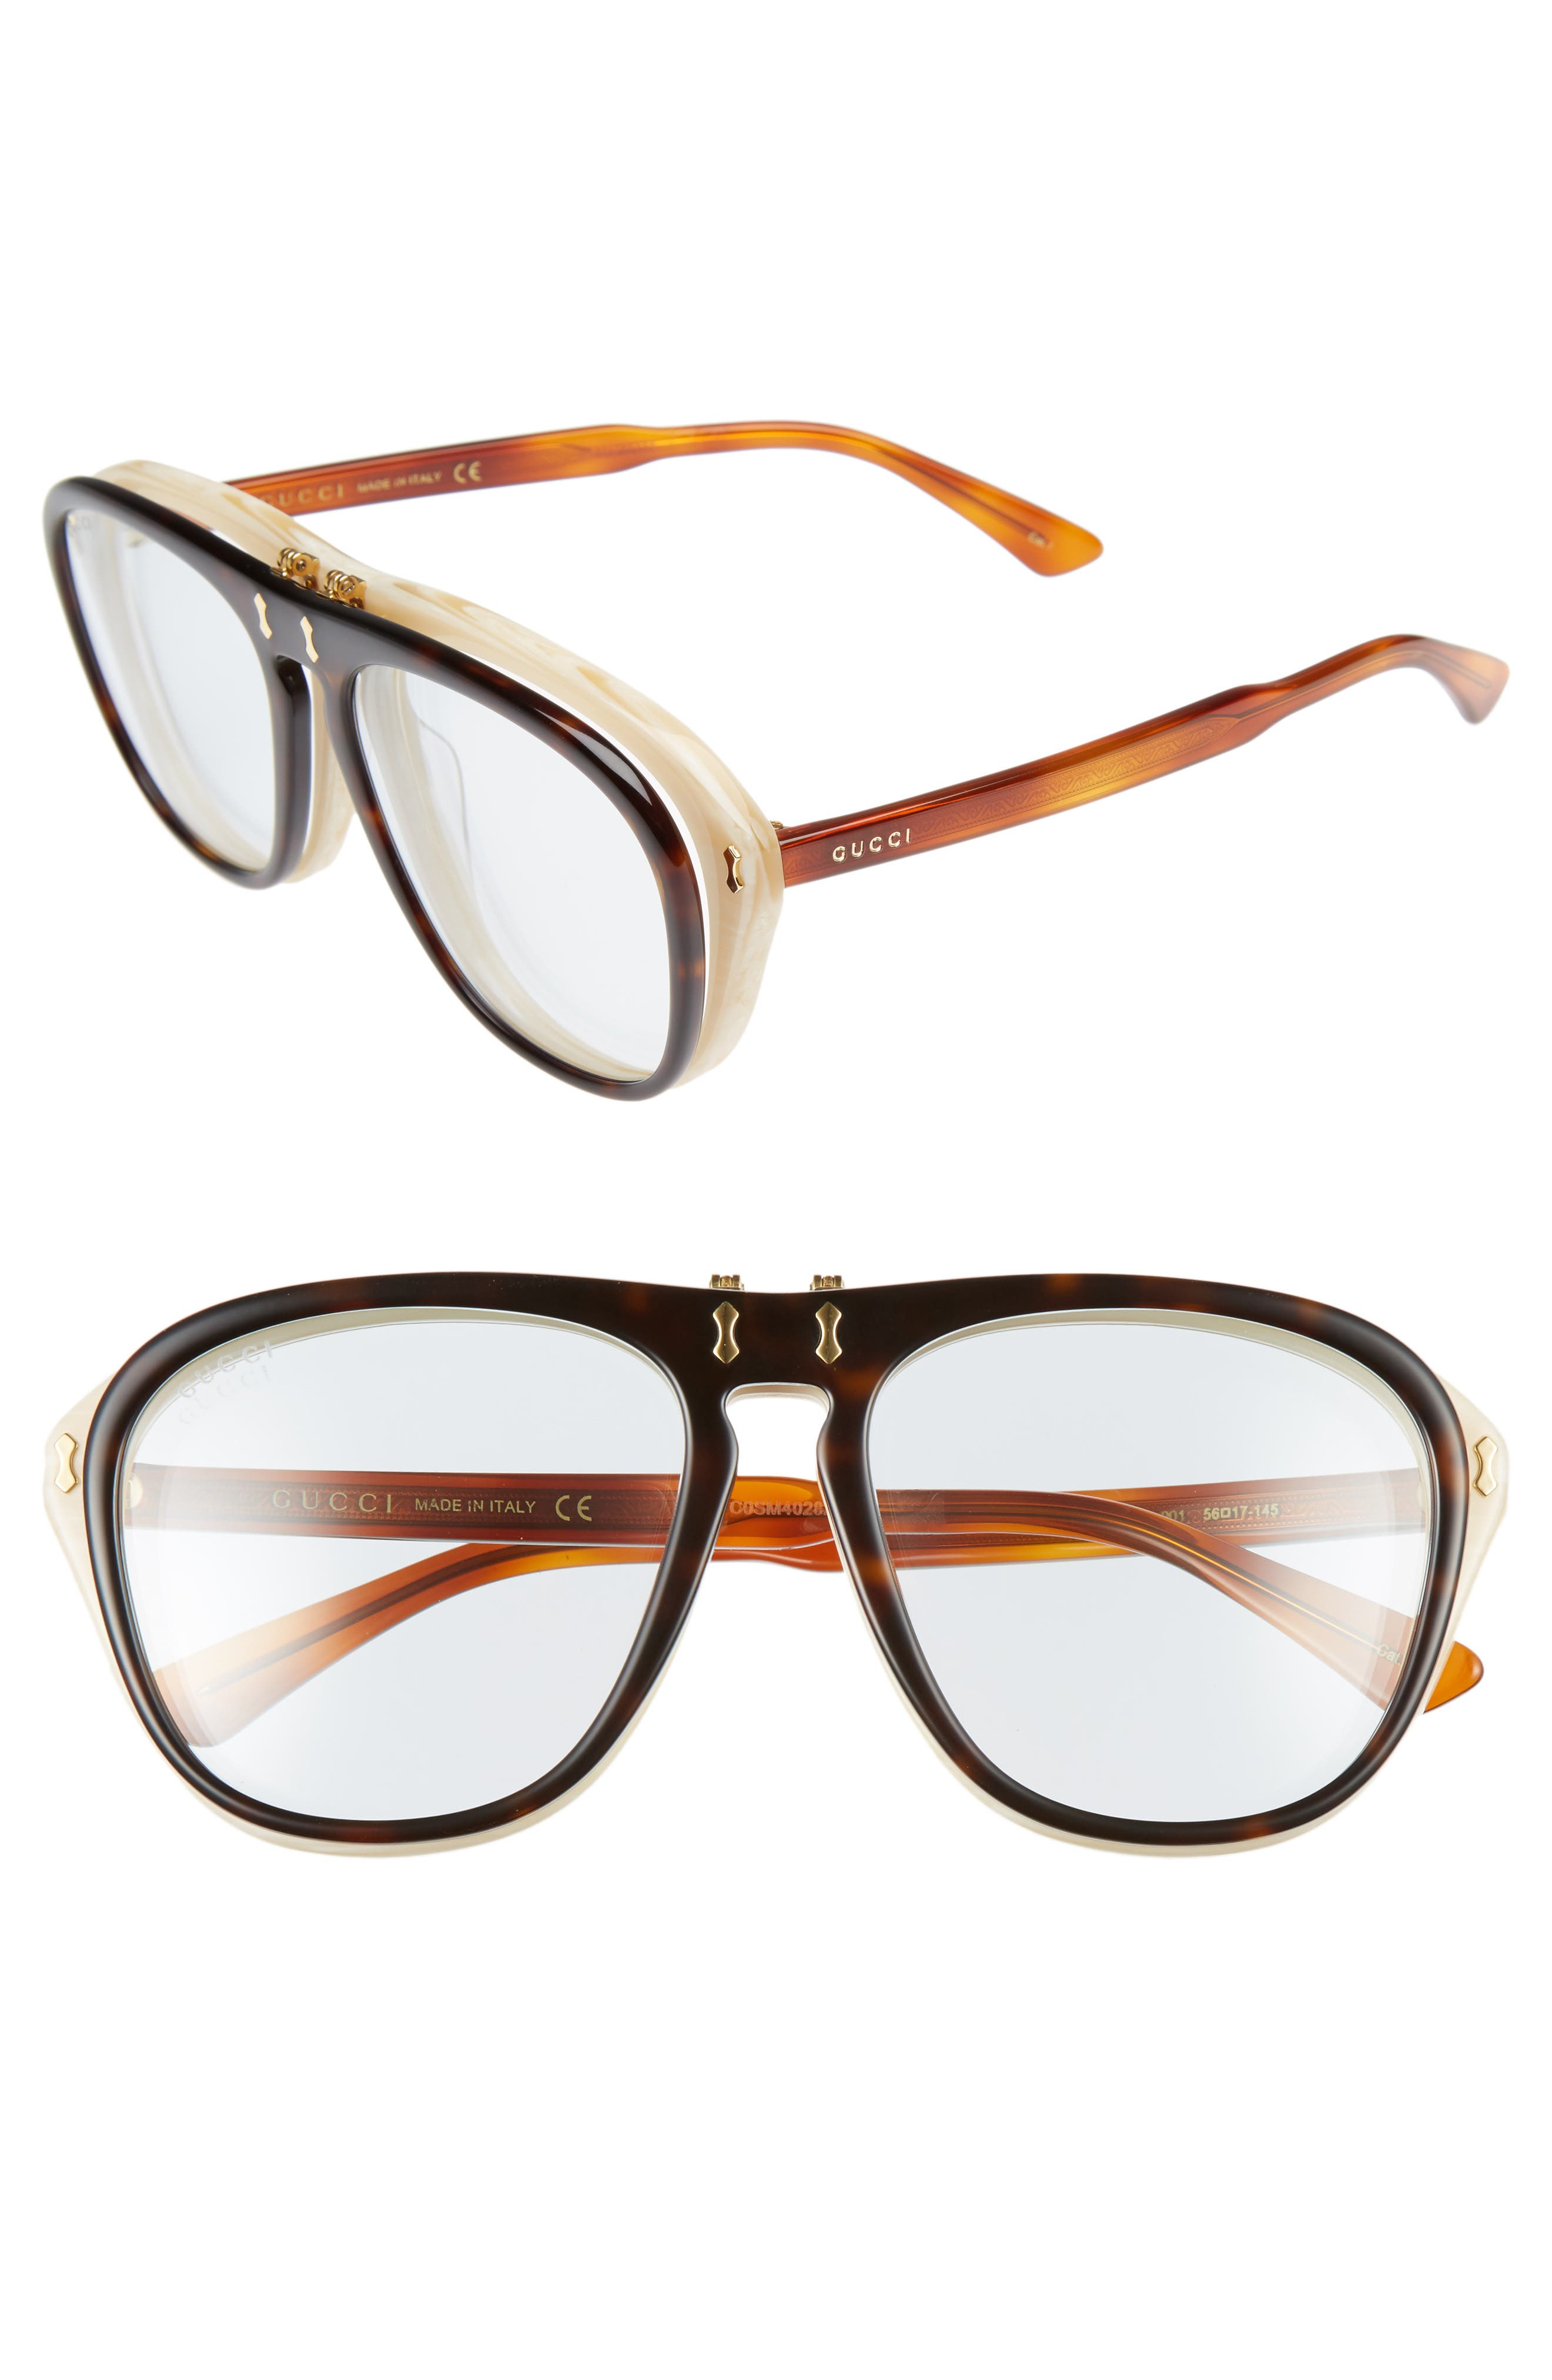 56mm Flip-Up Sunglasses,                             Main thumbnail 1, color,                             200